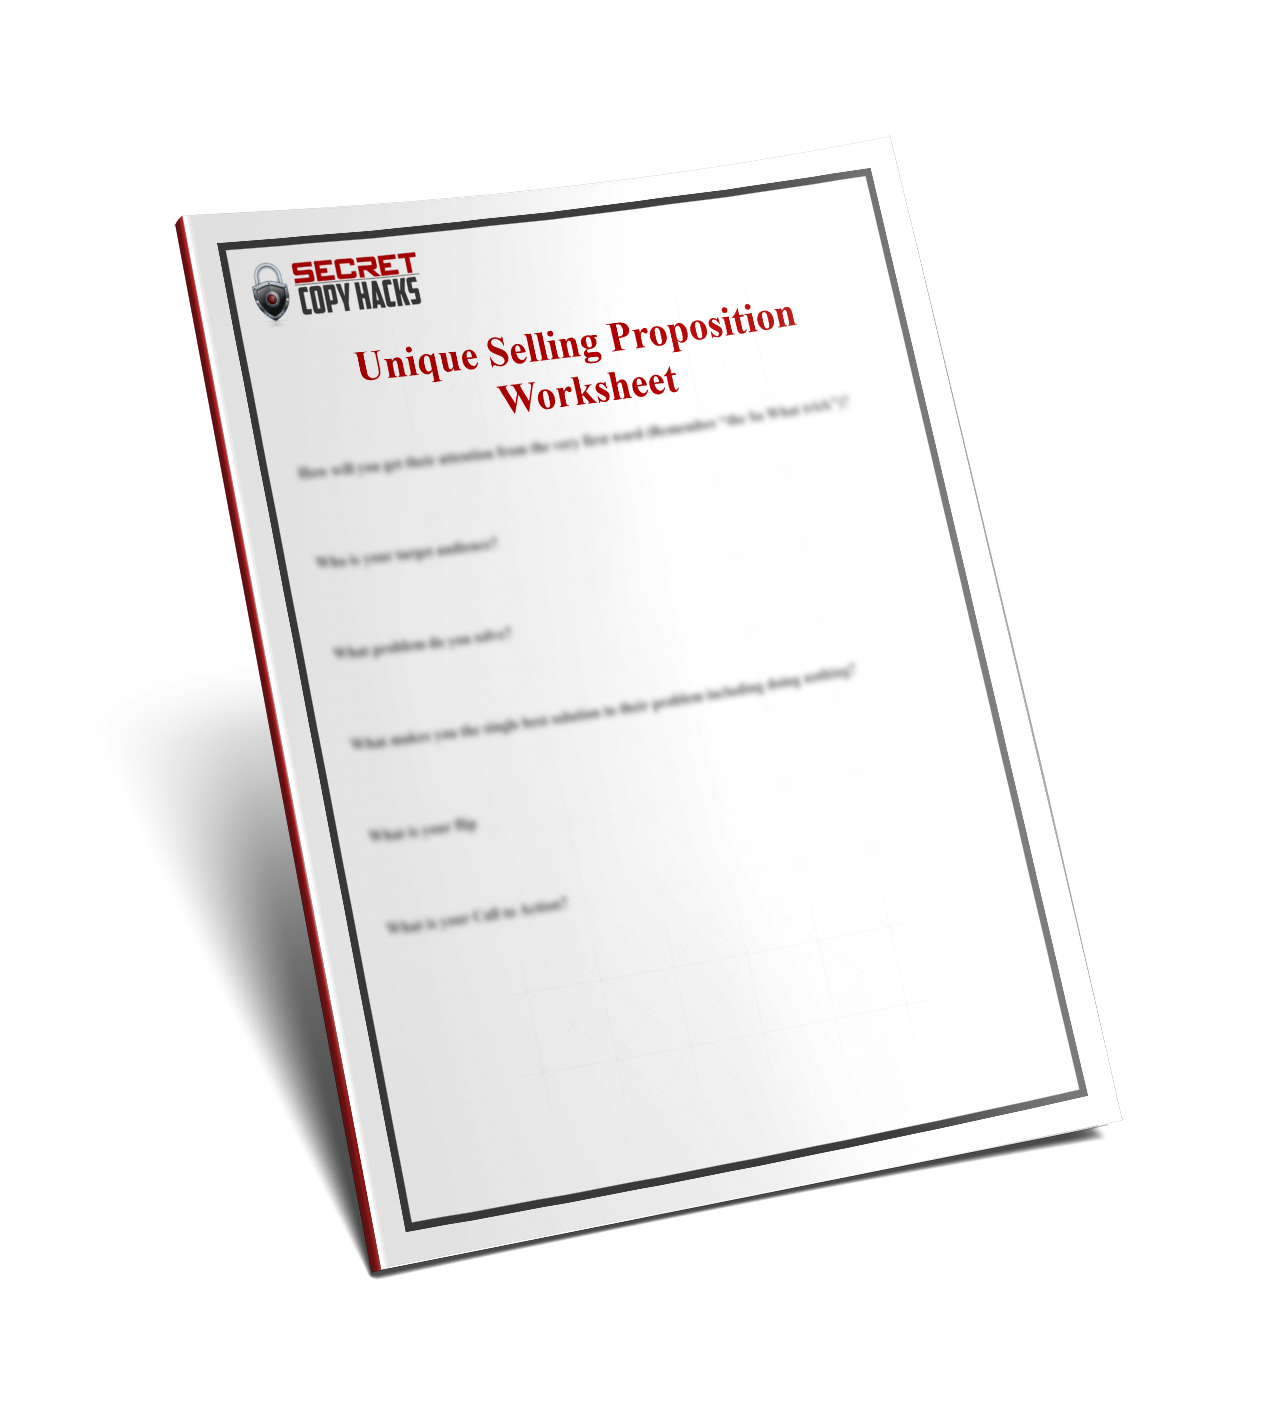 USP Worksheet